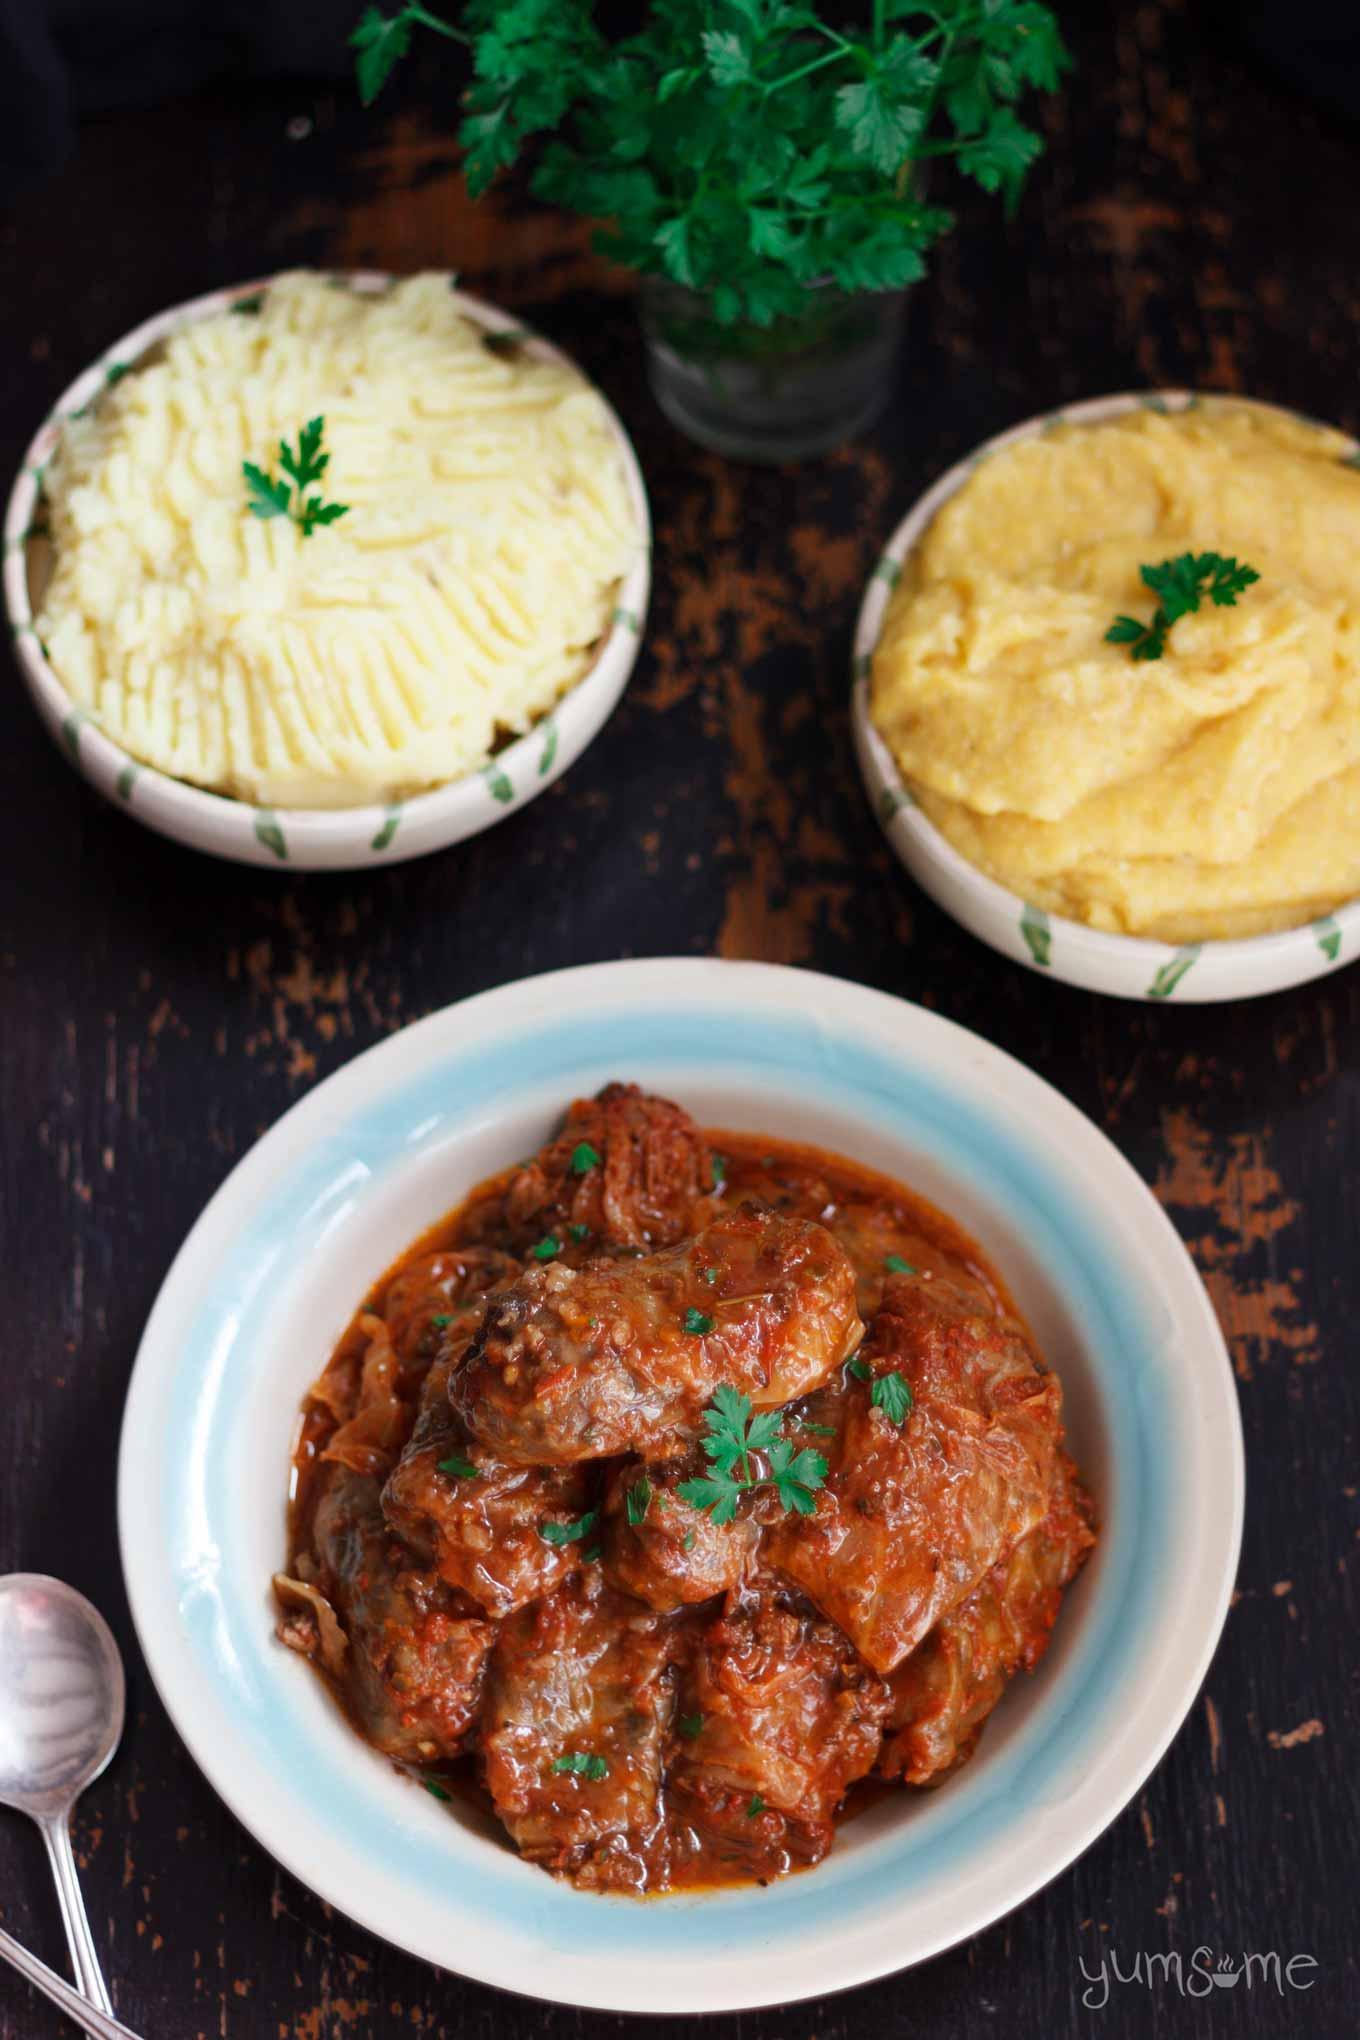 mashed potatoes, mamliga, and sarmale | yumsome.com